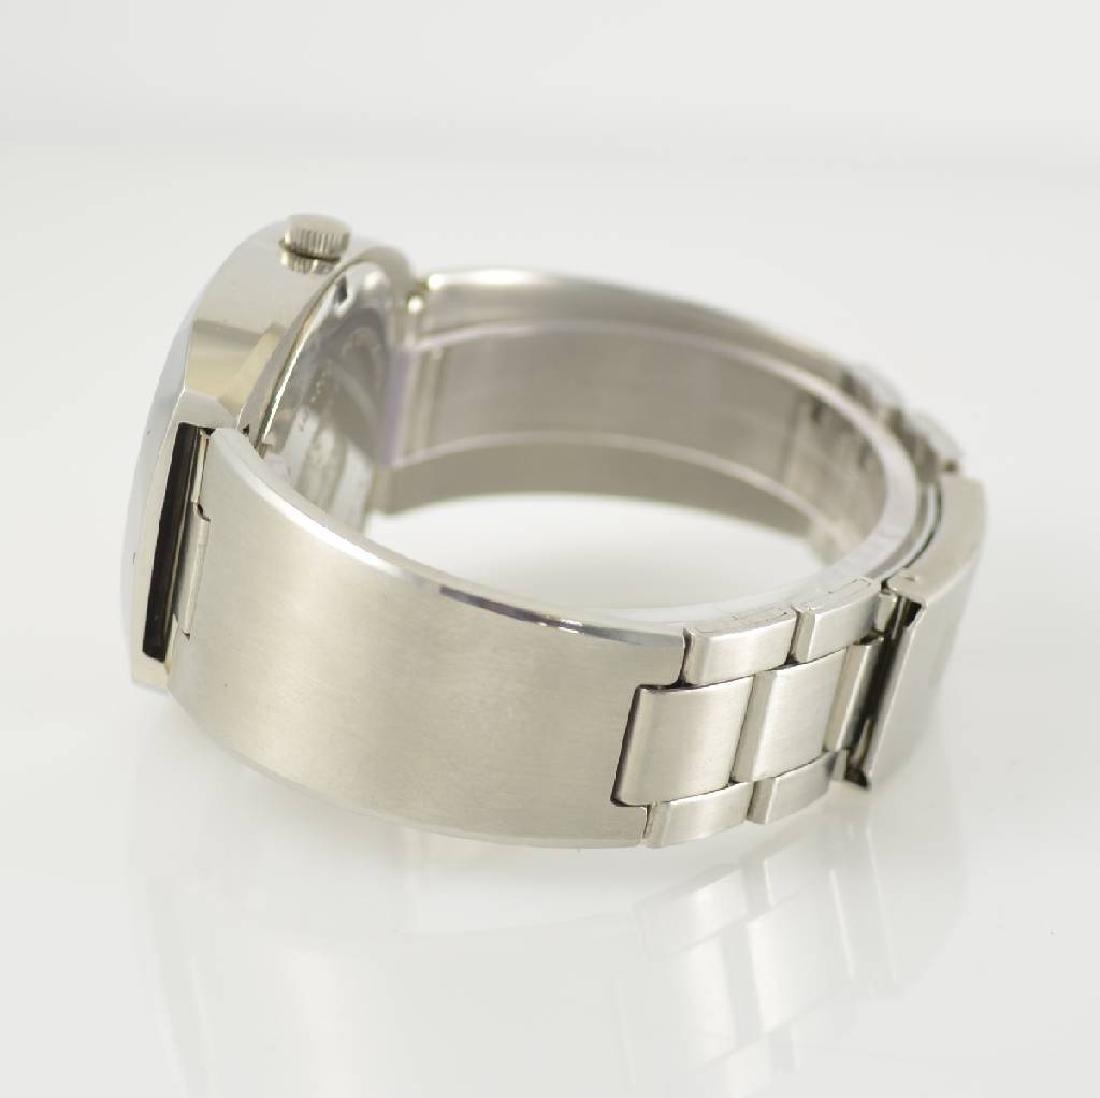 GLYCINE High Frequency gents wristwatch - 6